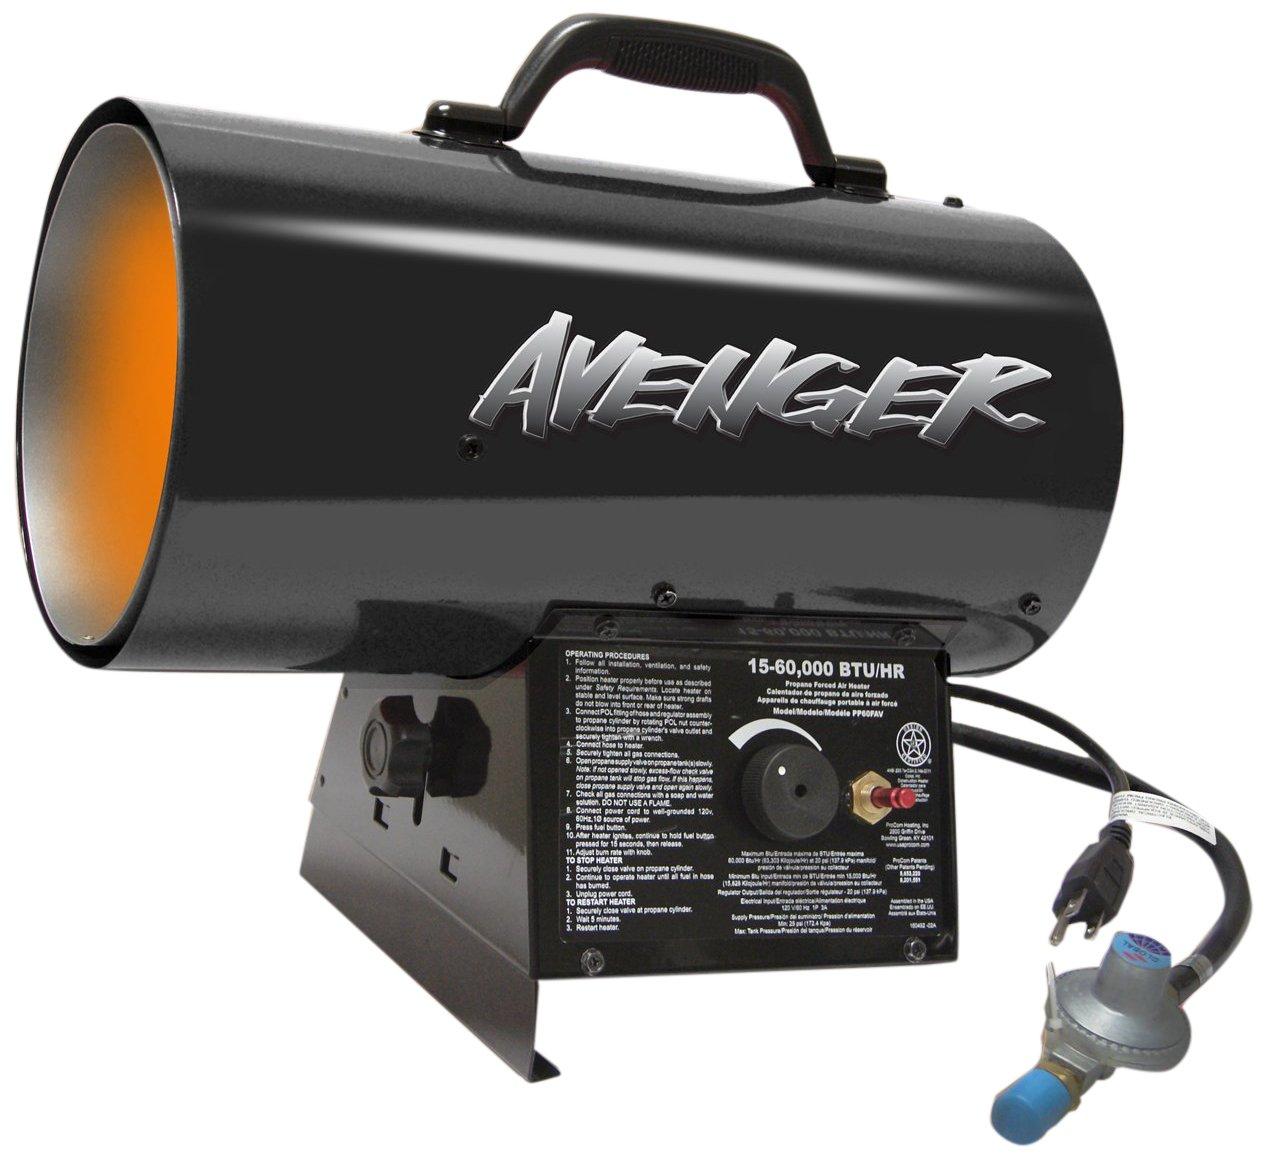 Avenger FBDFA60V Portable Forced Air Propane Heater, 60000 Btu